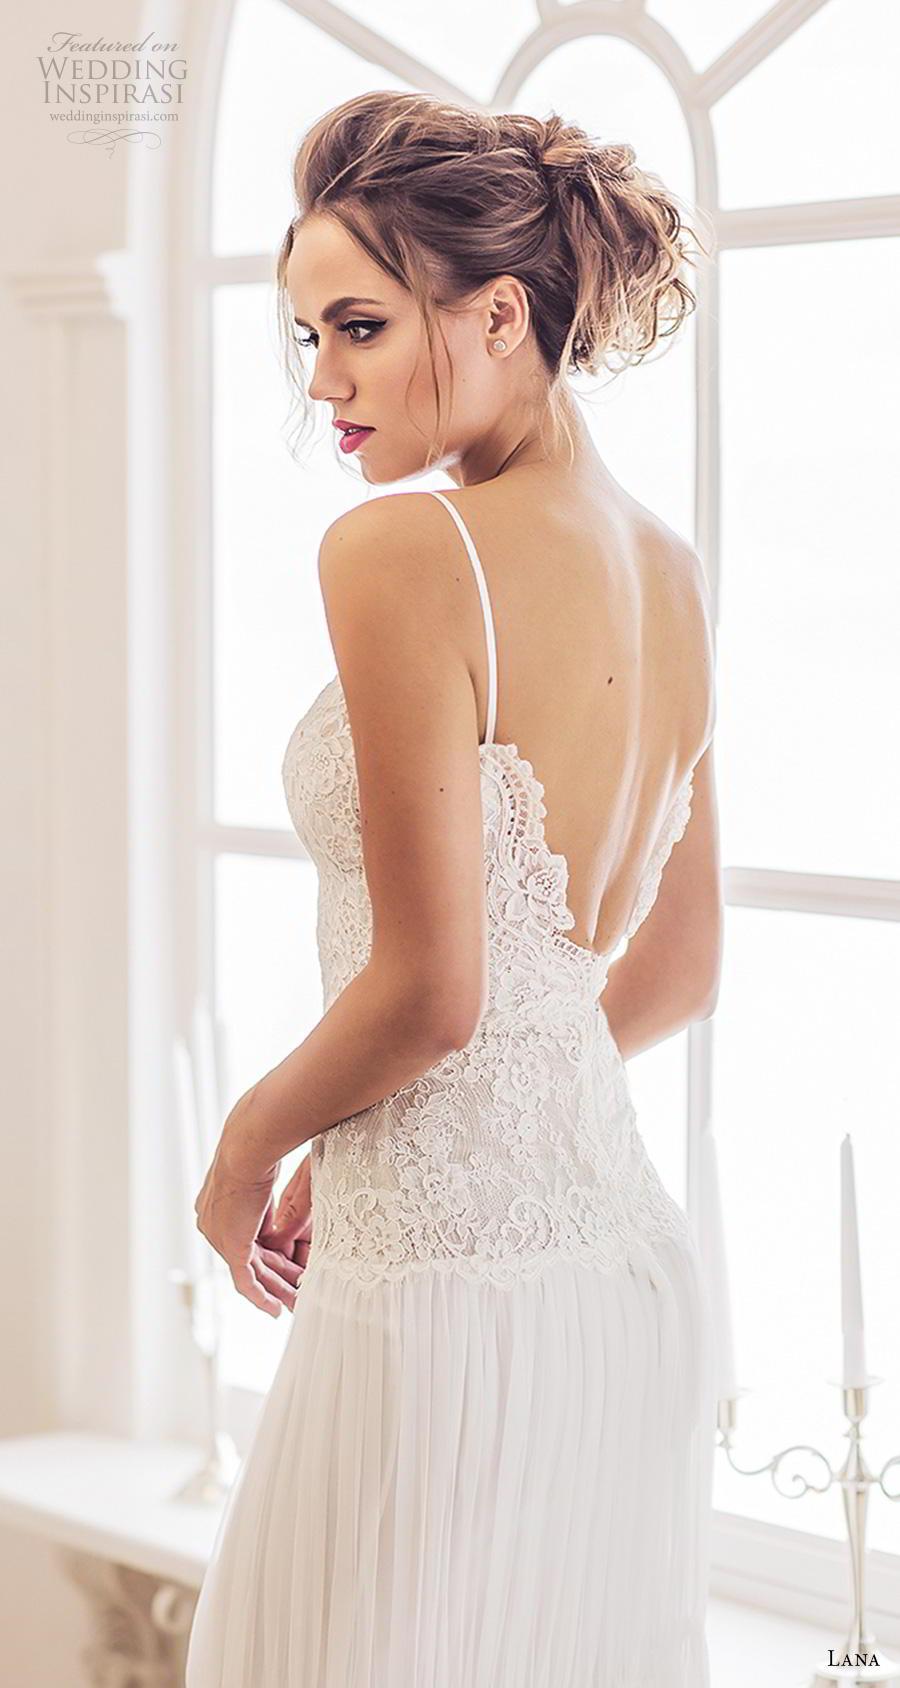 lana 2018 bridal spaghetti strap deep plunging sweetheart neckline heavily embellished bodice romantic sheath wedding dress backless v back sweep train (5) bv